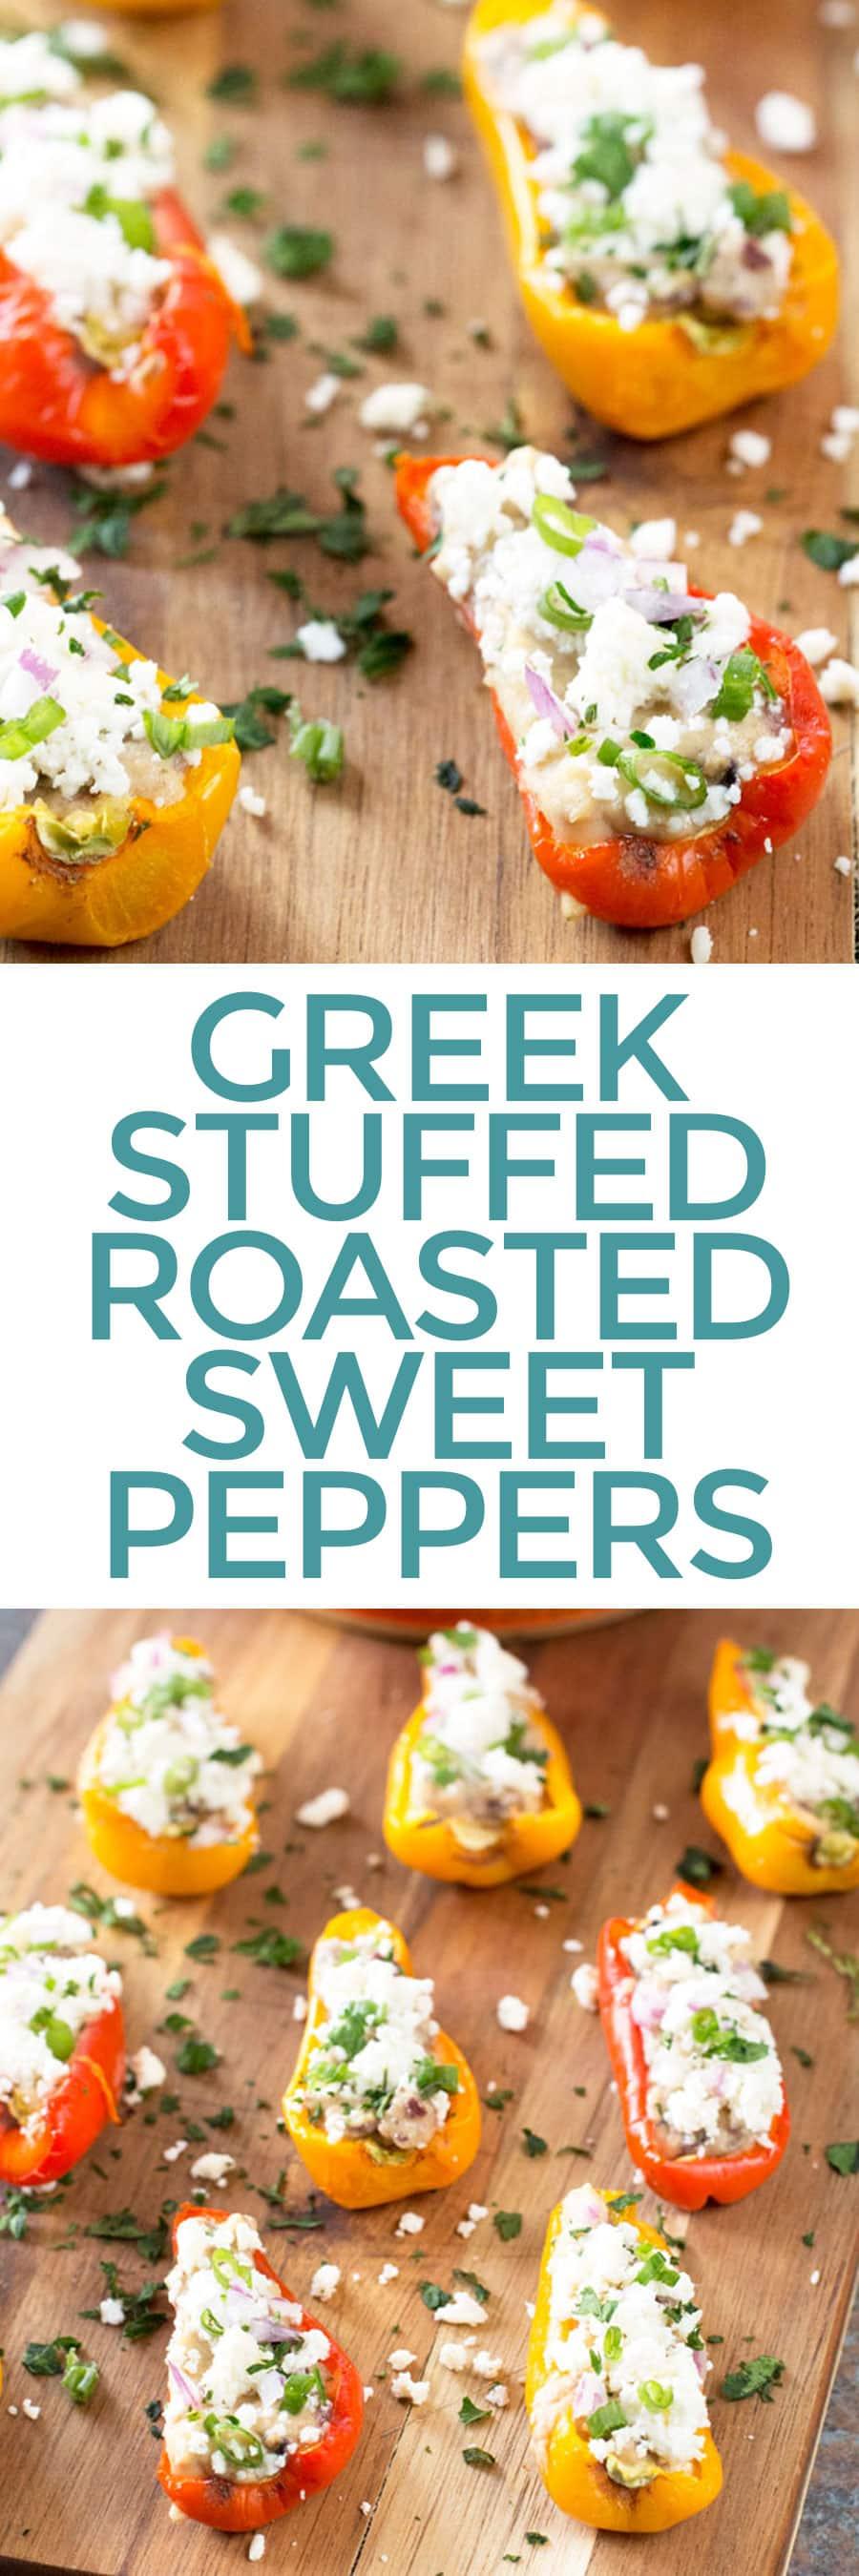 Greek Stuffed Roasted Sweet Peppers   cakenknife.com